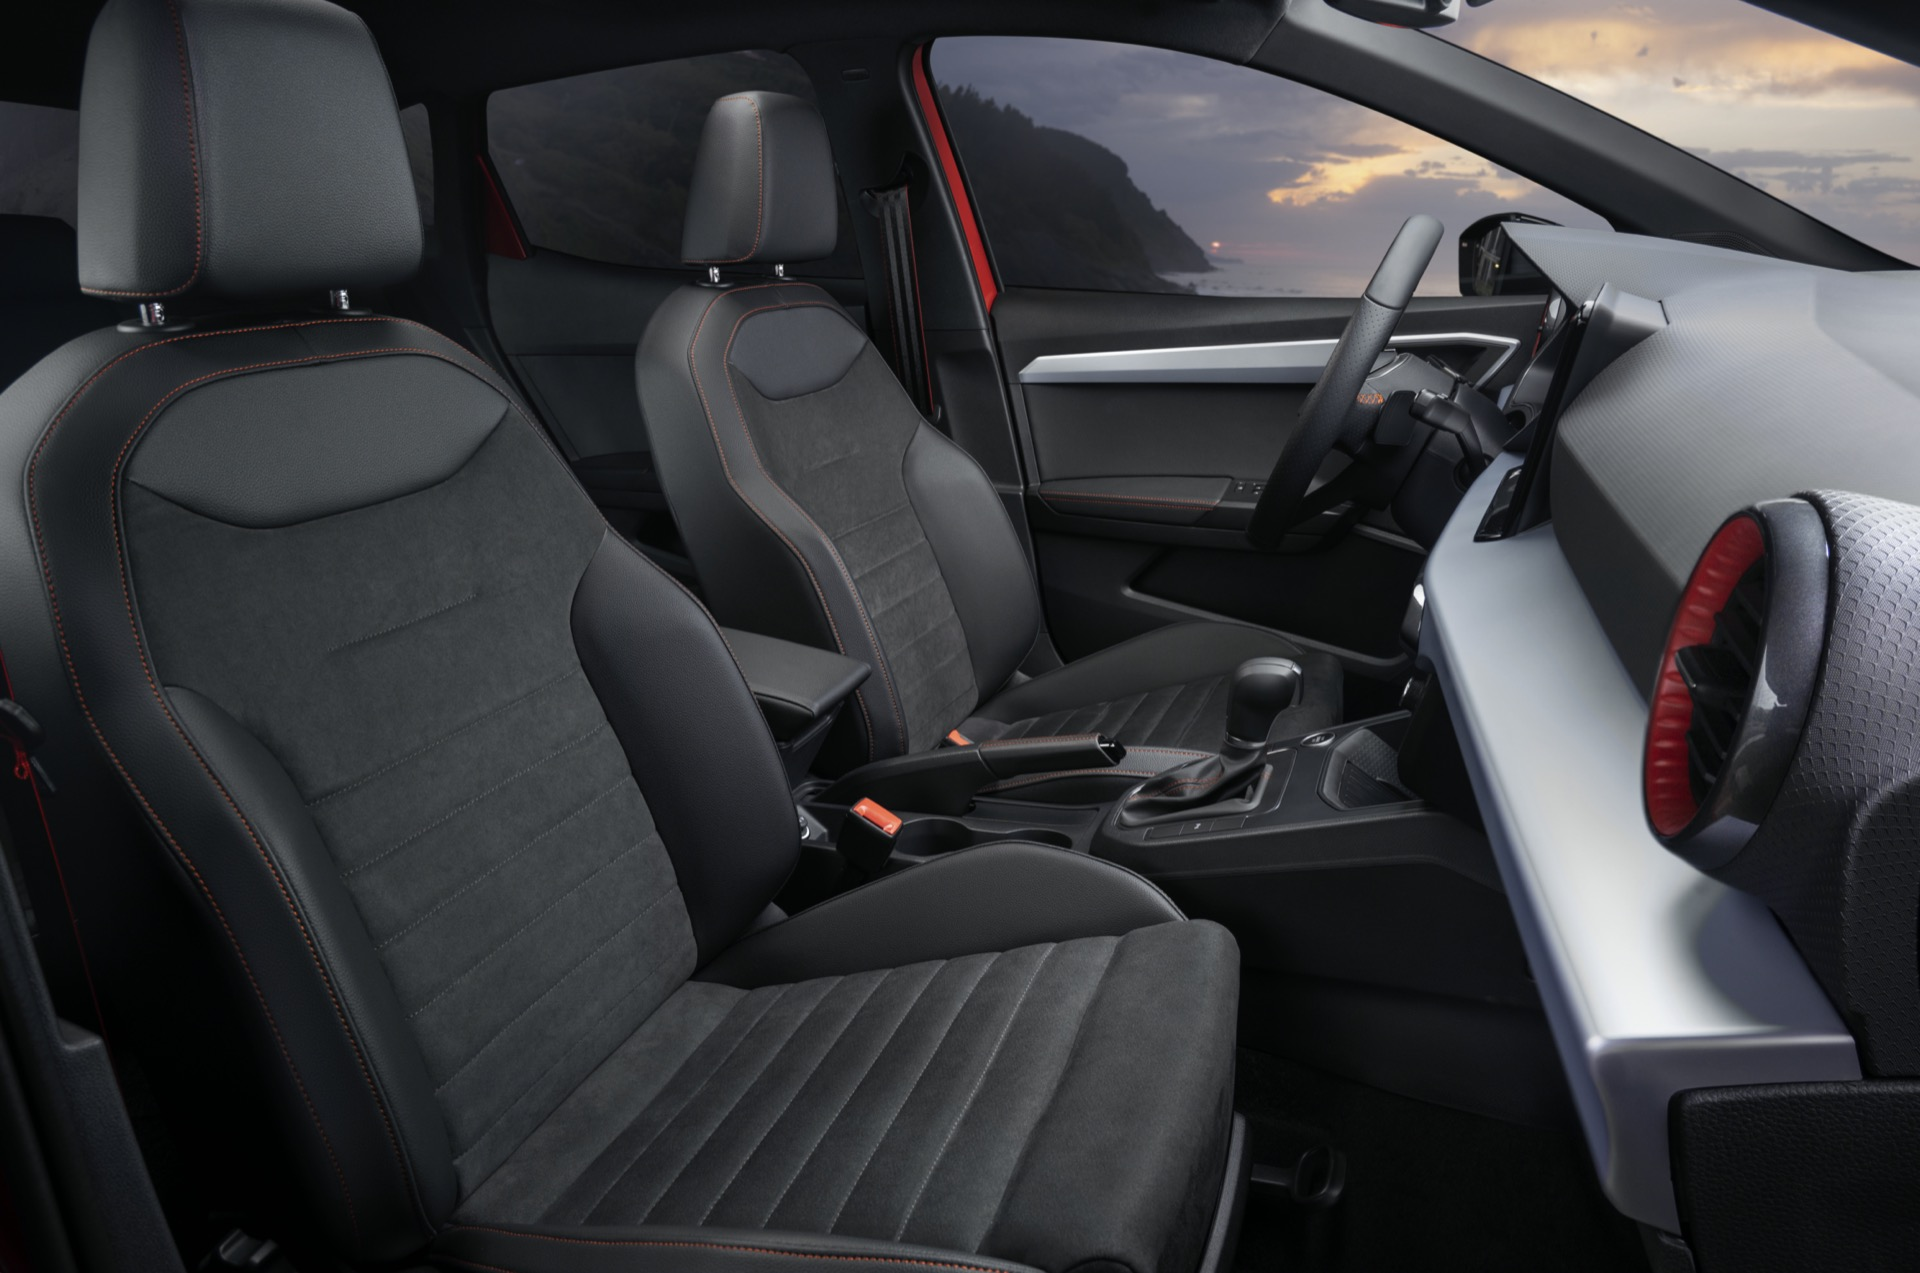 Seat Ibiza 20